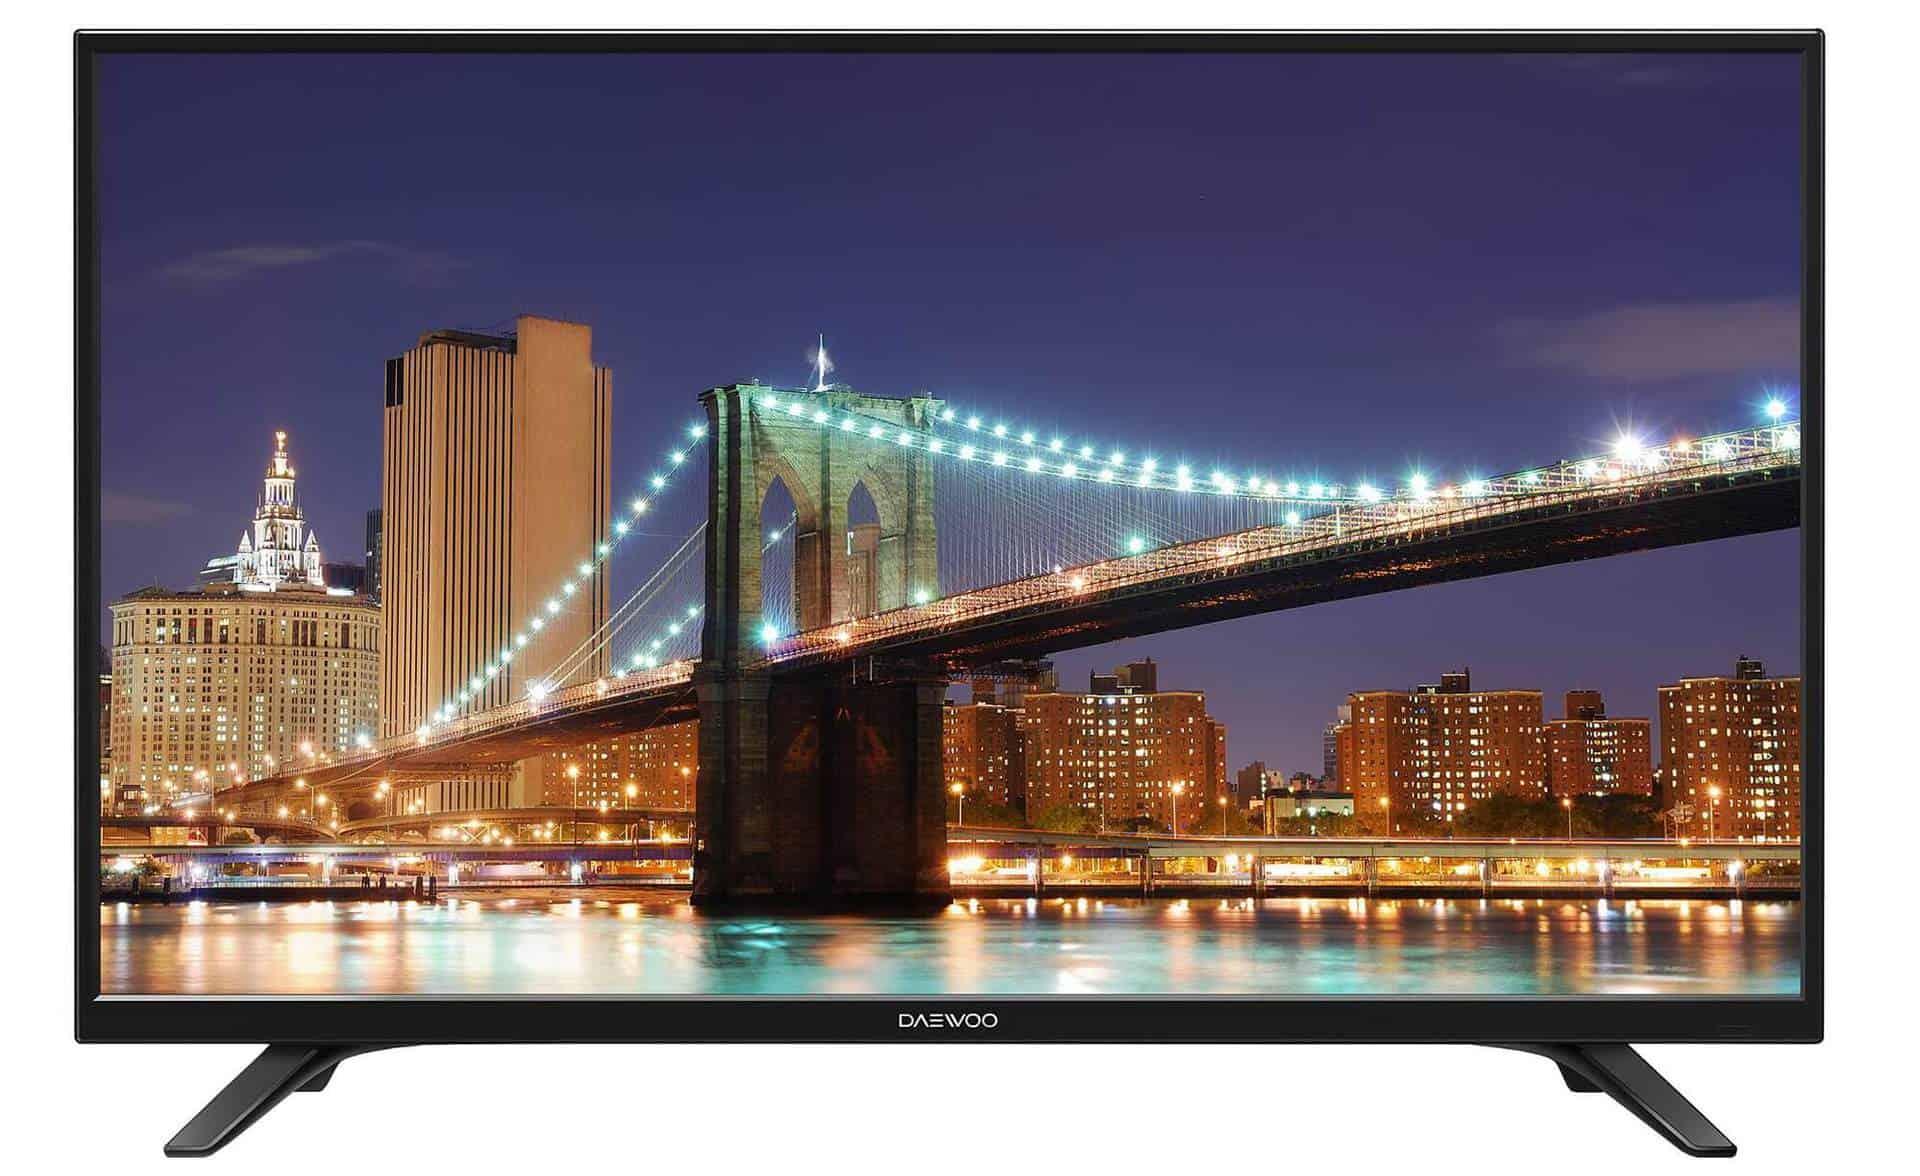 Daewoo L40R640CTE - televizor Full HD LED din gama 2016 cu diagonala de 101 cm!